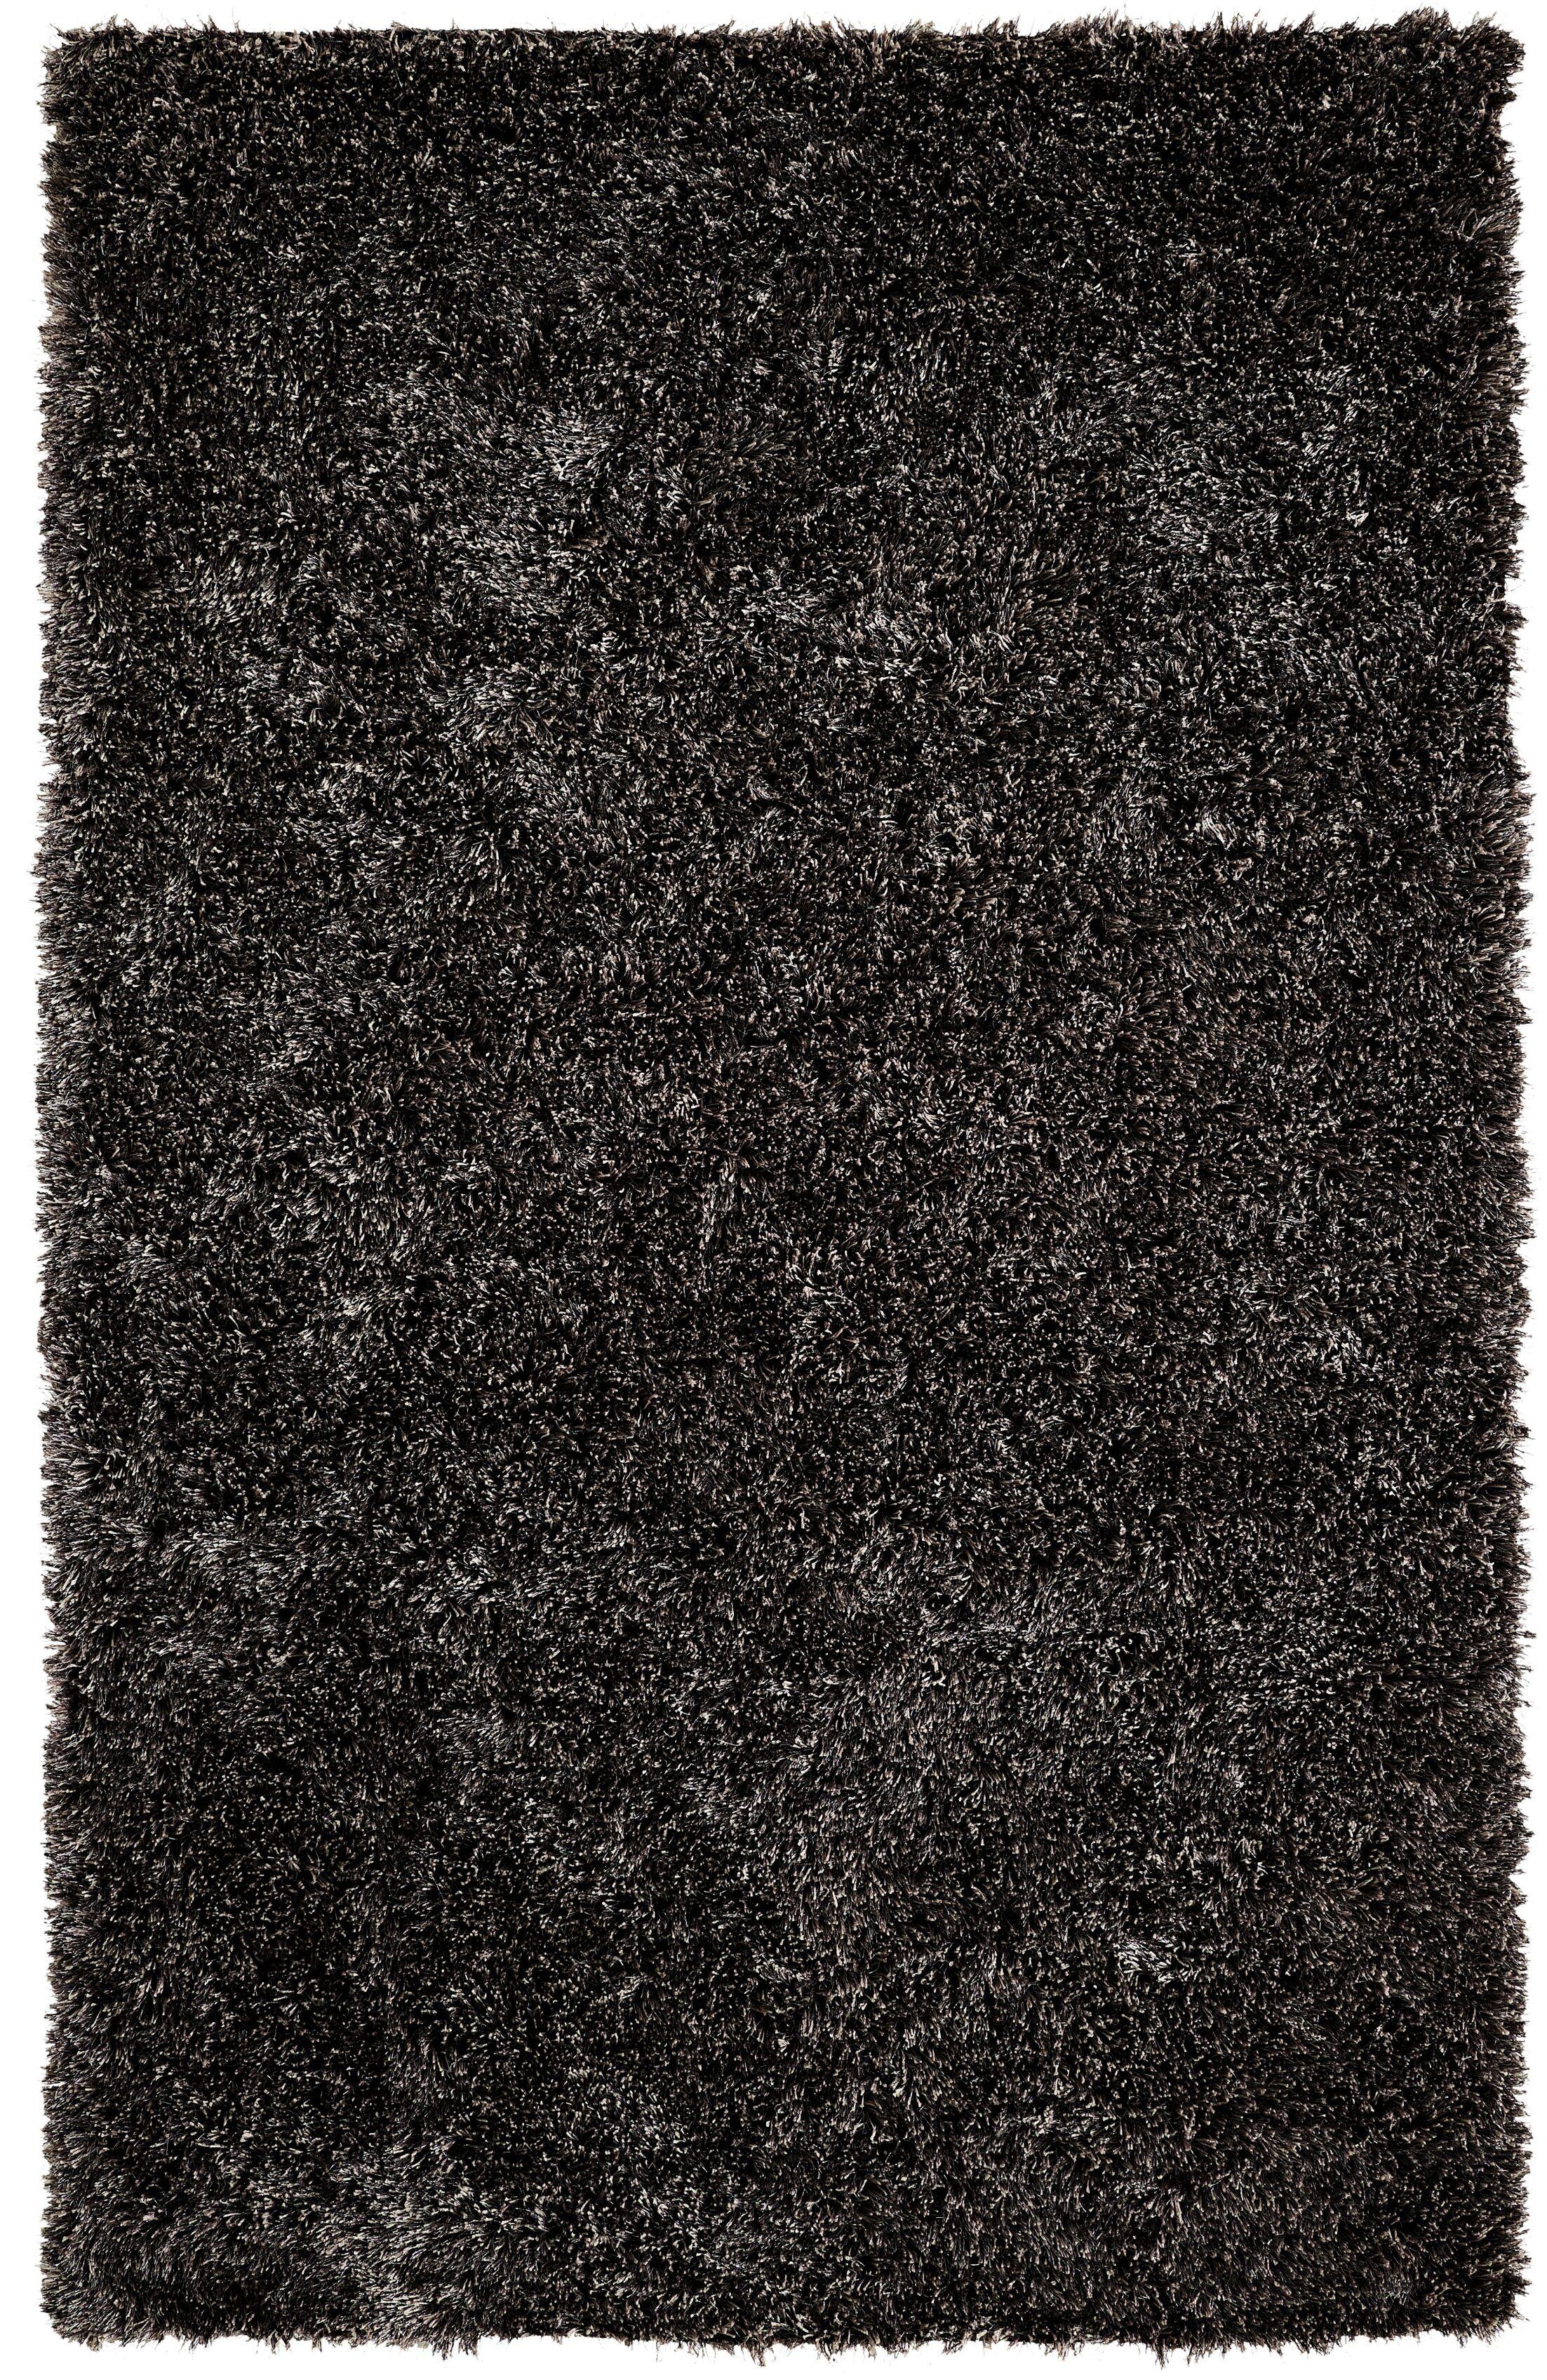 Makawee Black/Grey Rug Rug Size: Rectangle 5' x 8'